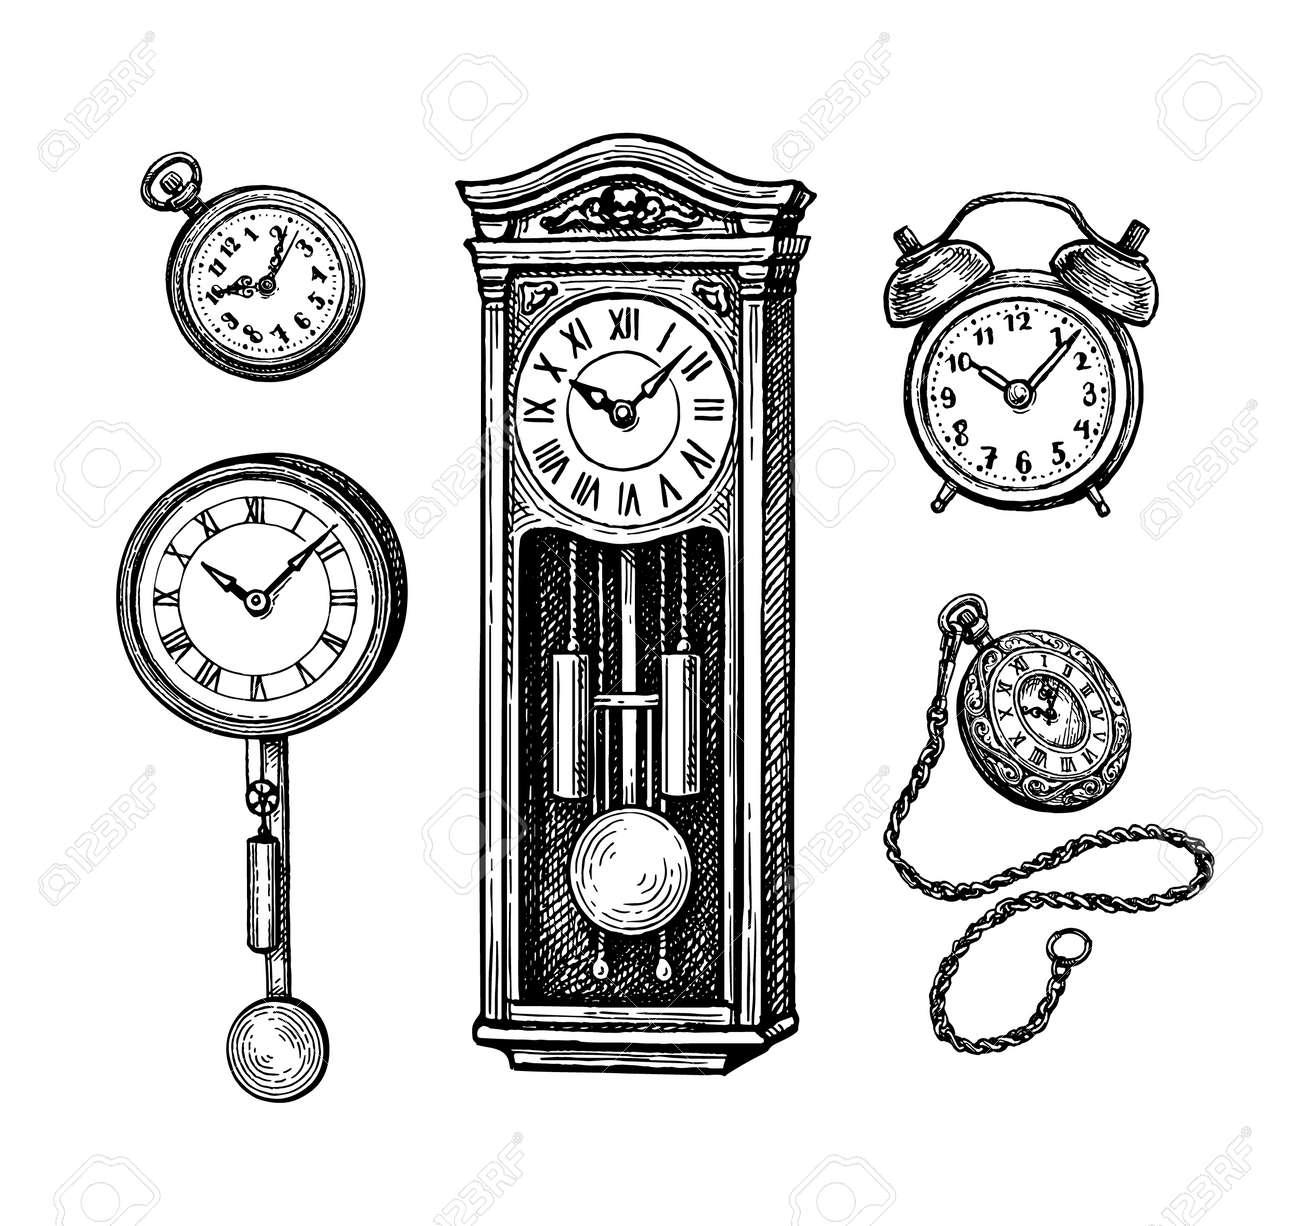 Different types of vintage clocks. - 149044670